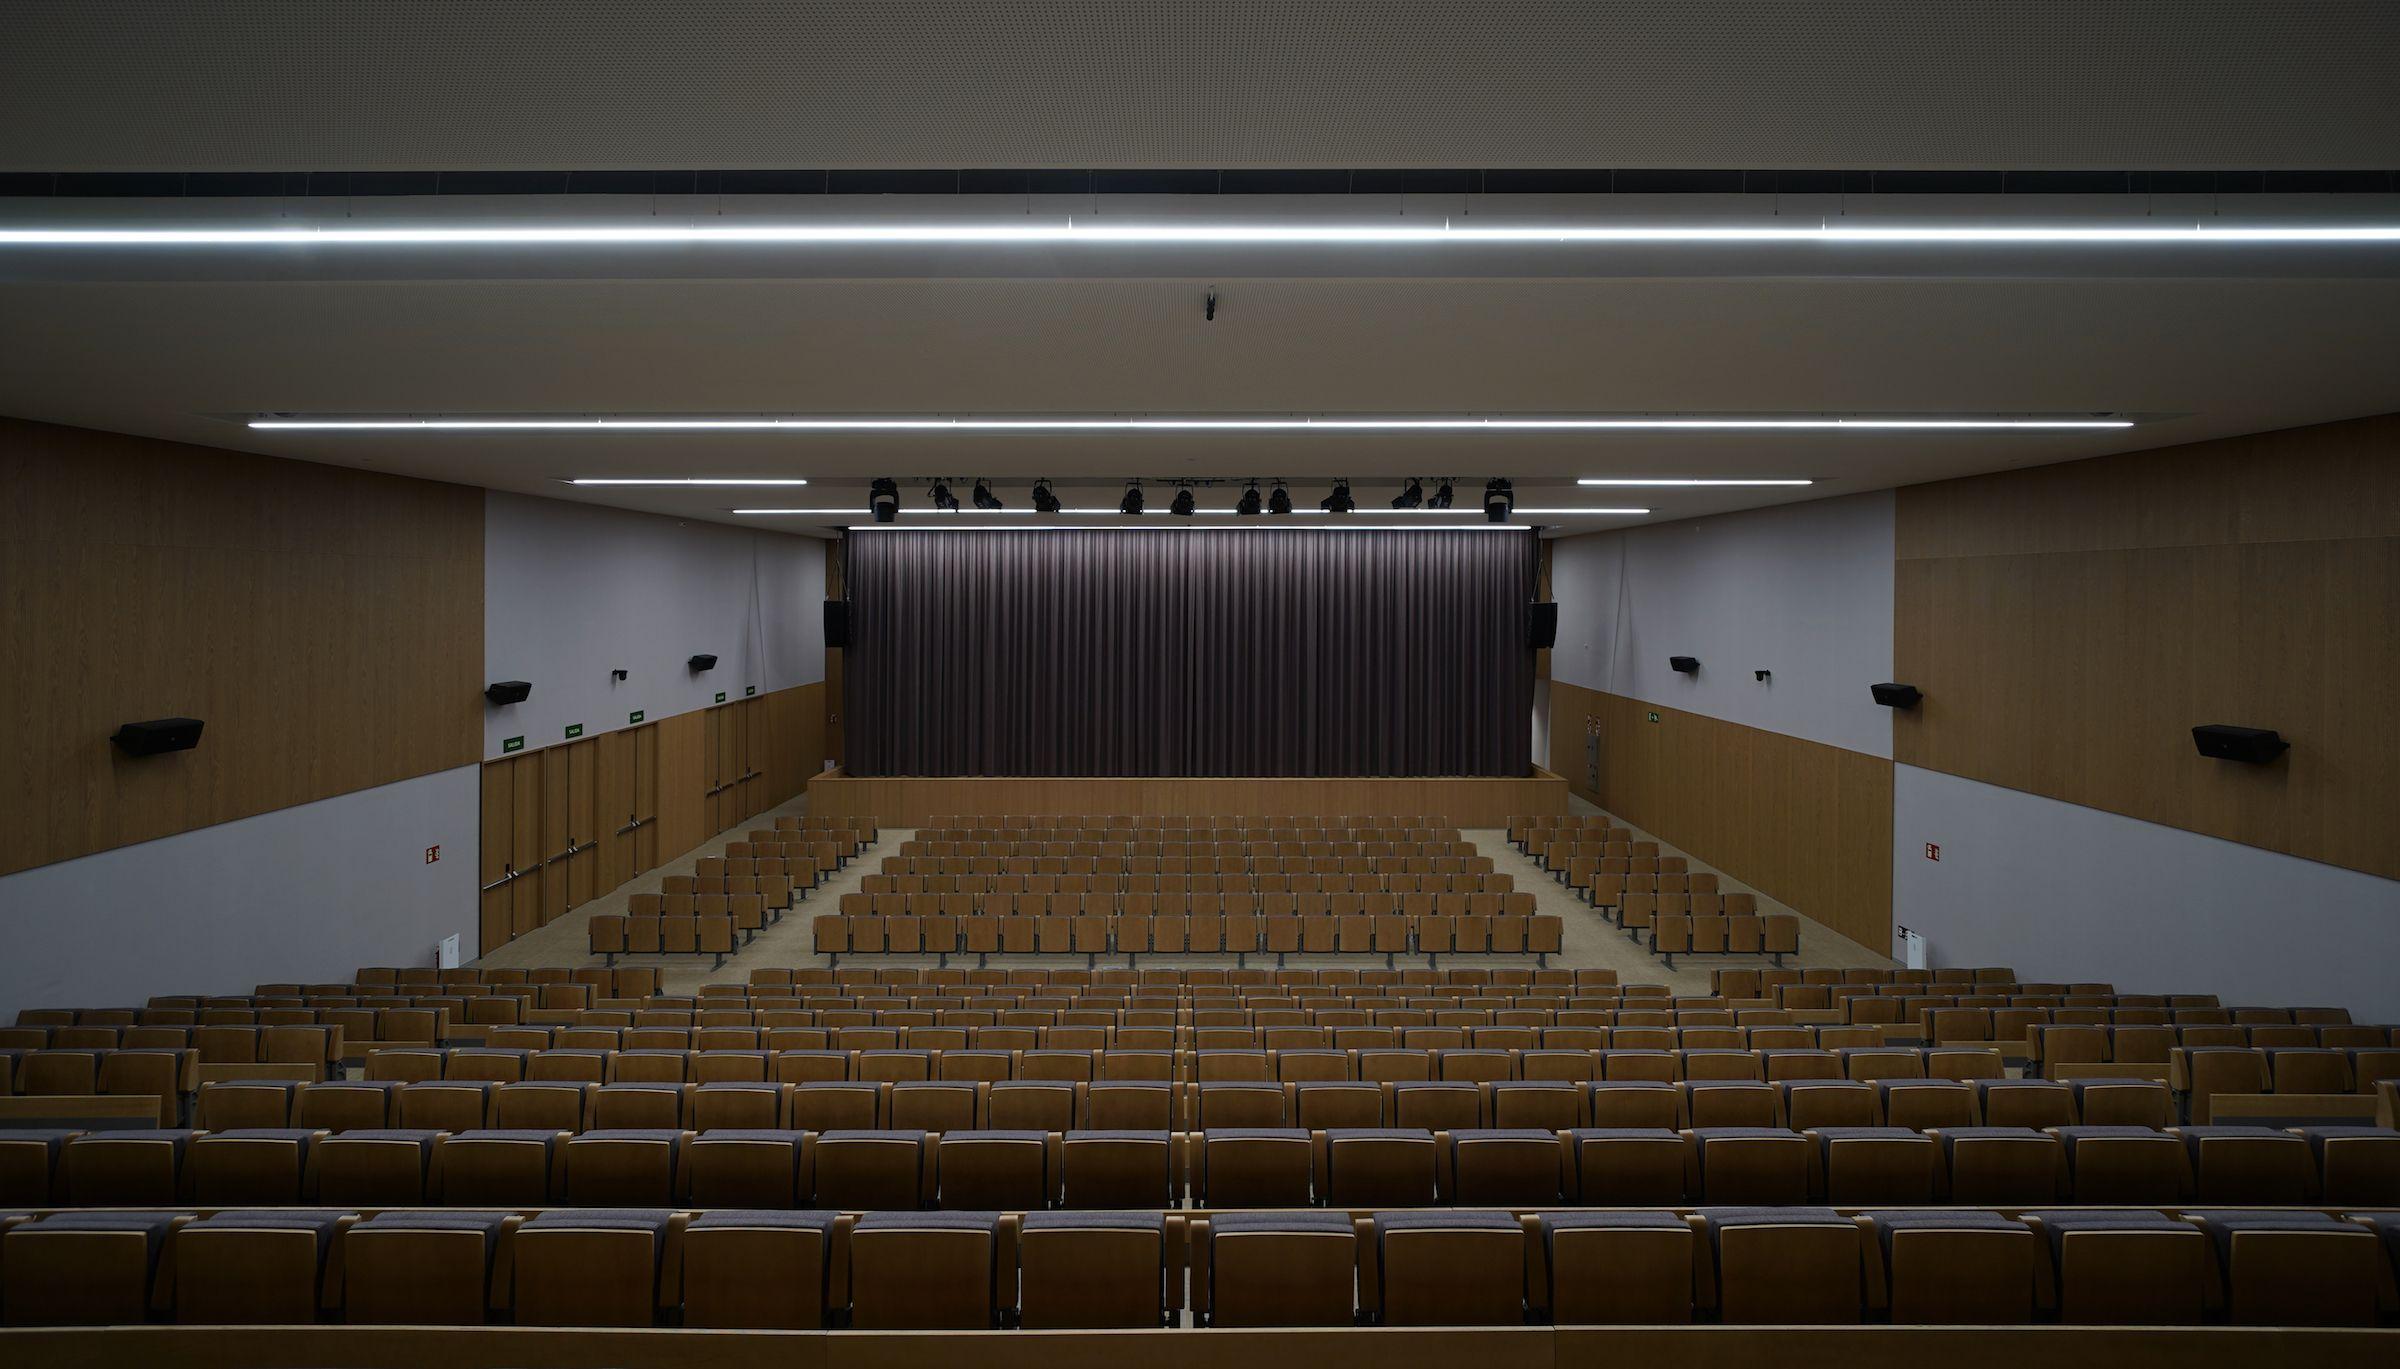 Aula Magna del Interior del hall del Paraninfo CEU UCH. FOTO: MAIN FORMS IDOM UTE. Director del equipo Arq. D. Guillermo Mocholí Ferrándiz.